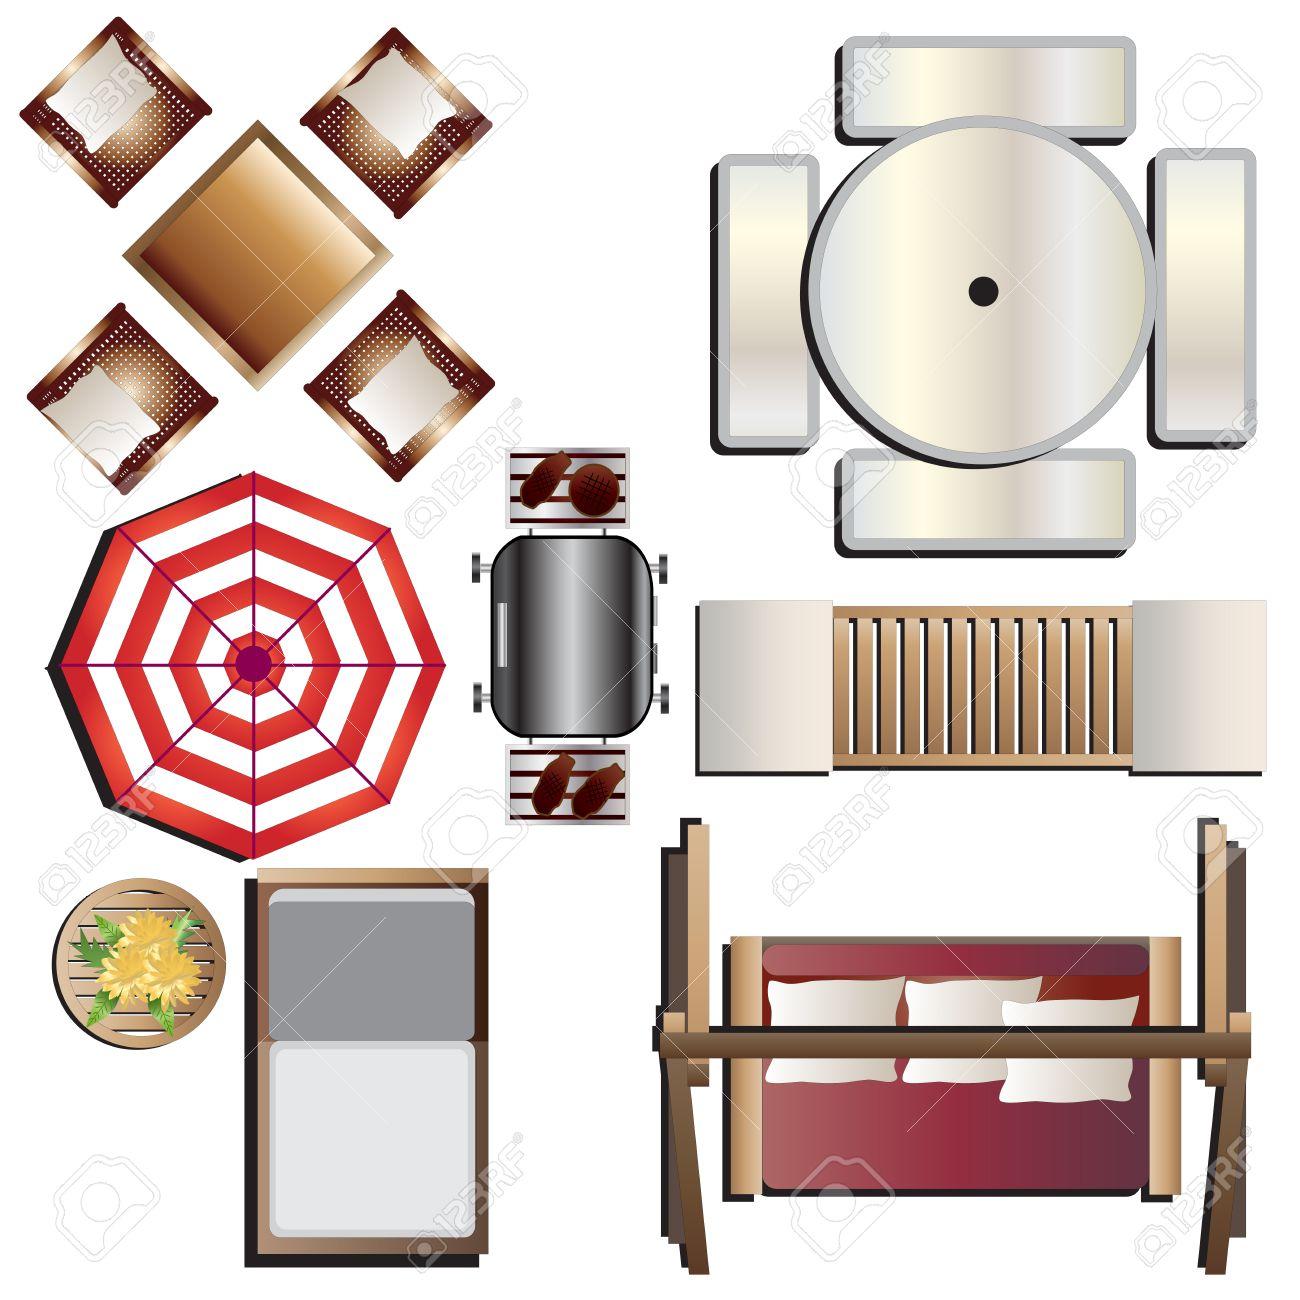 Outdoor Furniture Top View Set 17 For Landscape Design Vector Illustration Stock